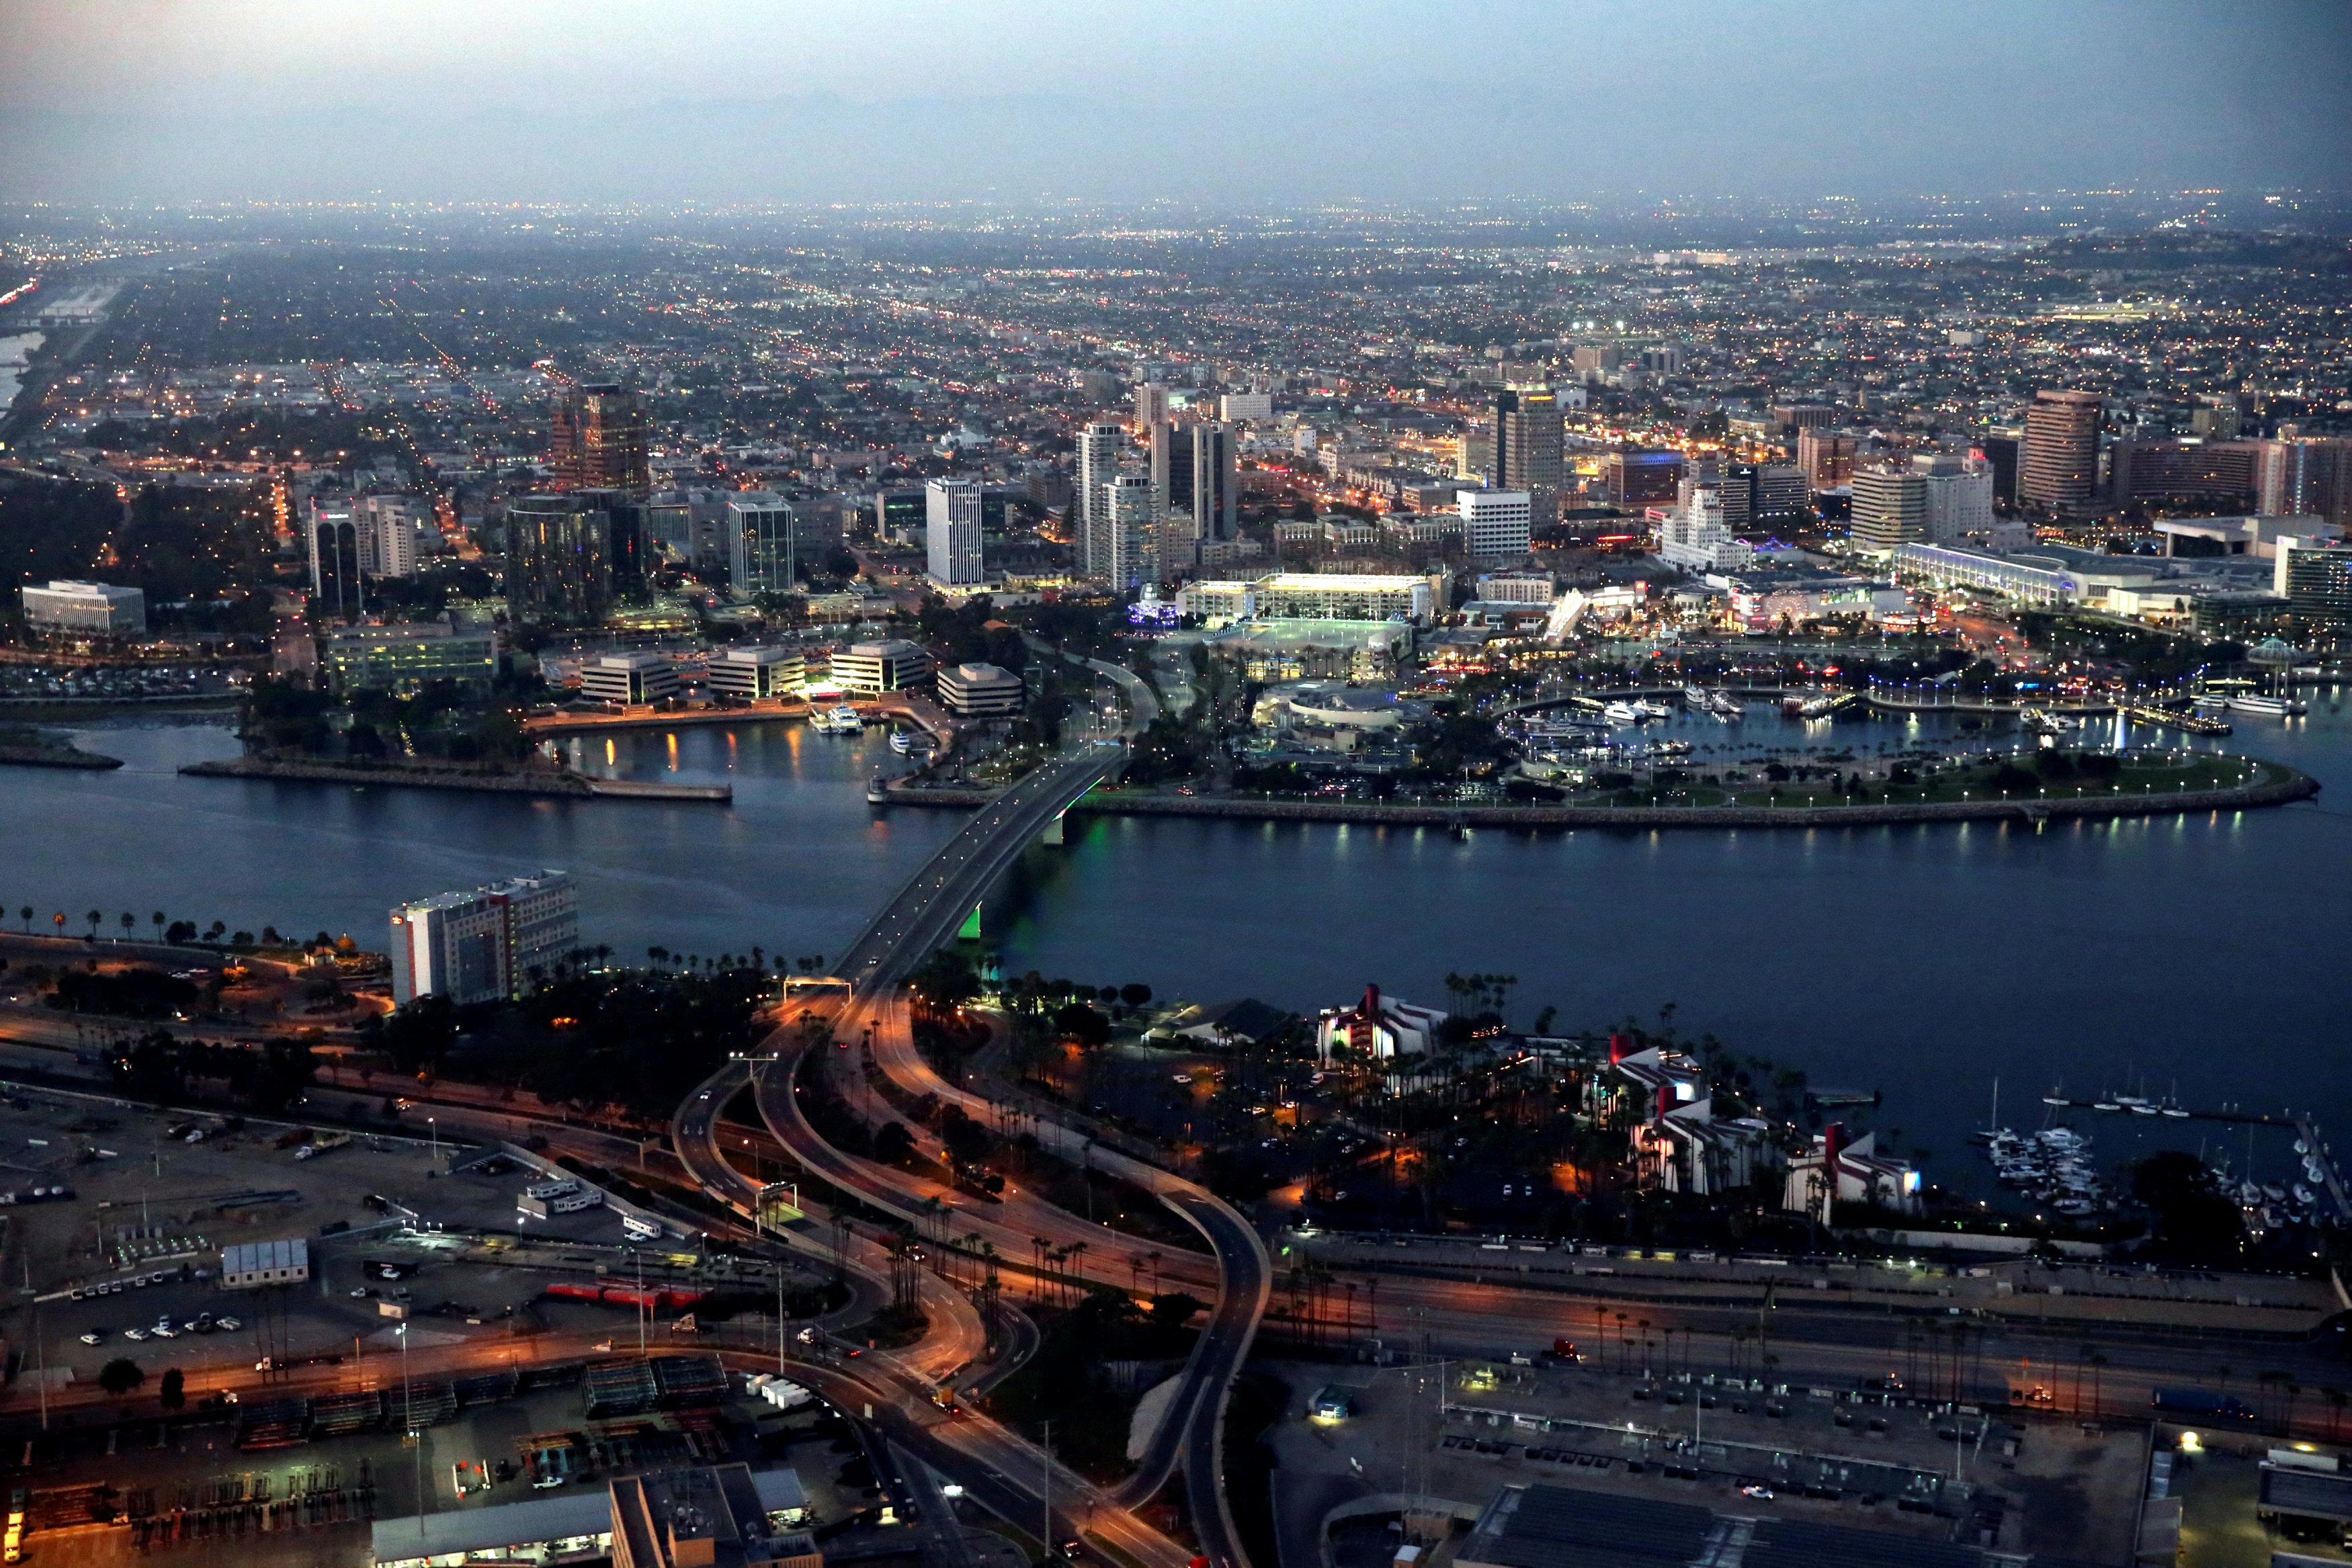 The city of Long Beach is seen at dusk, California, U.S., September 8, 201